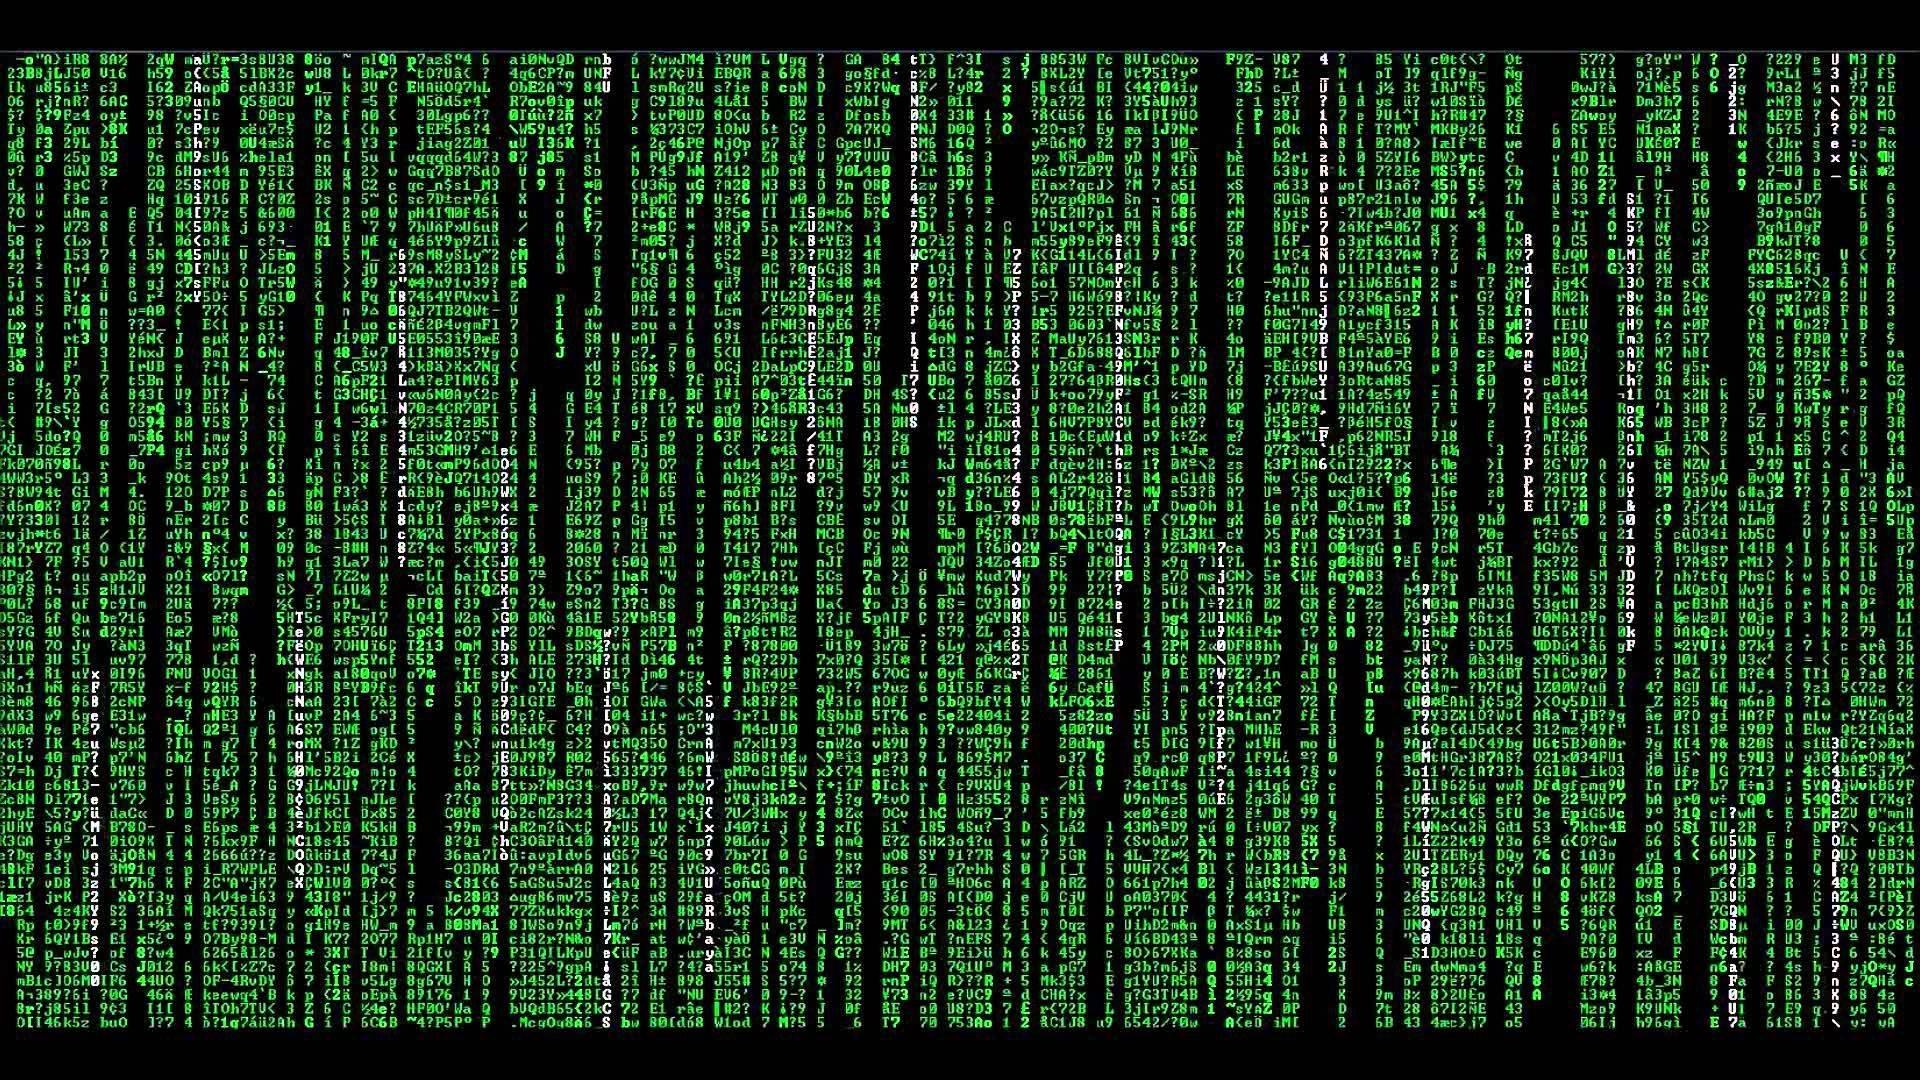 matrix wallpapers 1920x1080 group (93+)